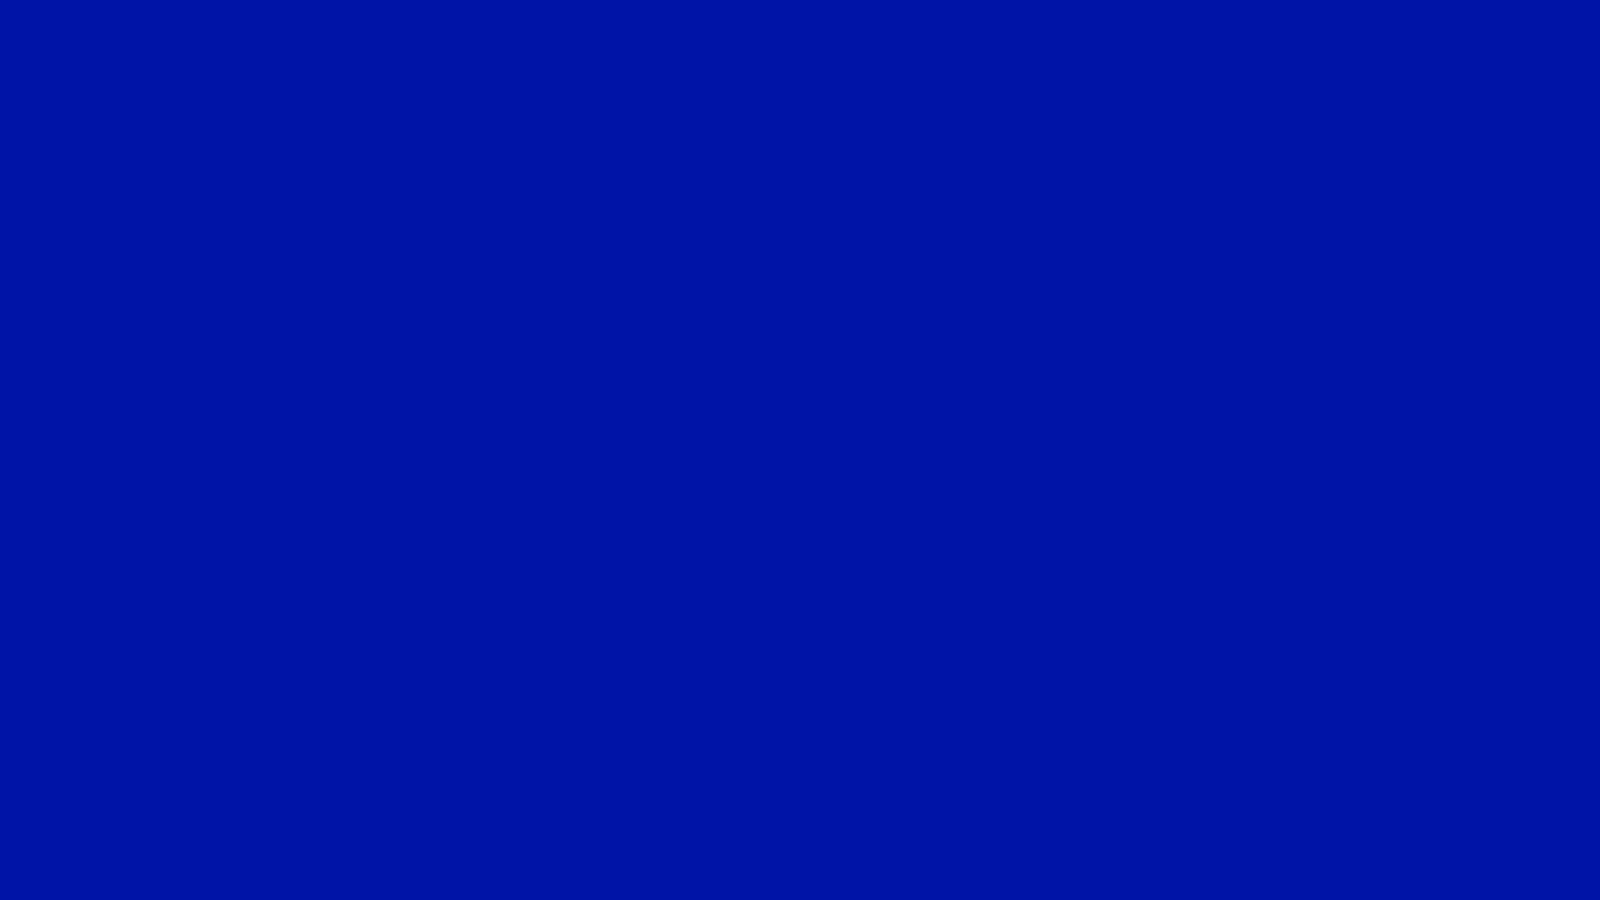 1600x900 Zaffre Solid Color Background